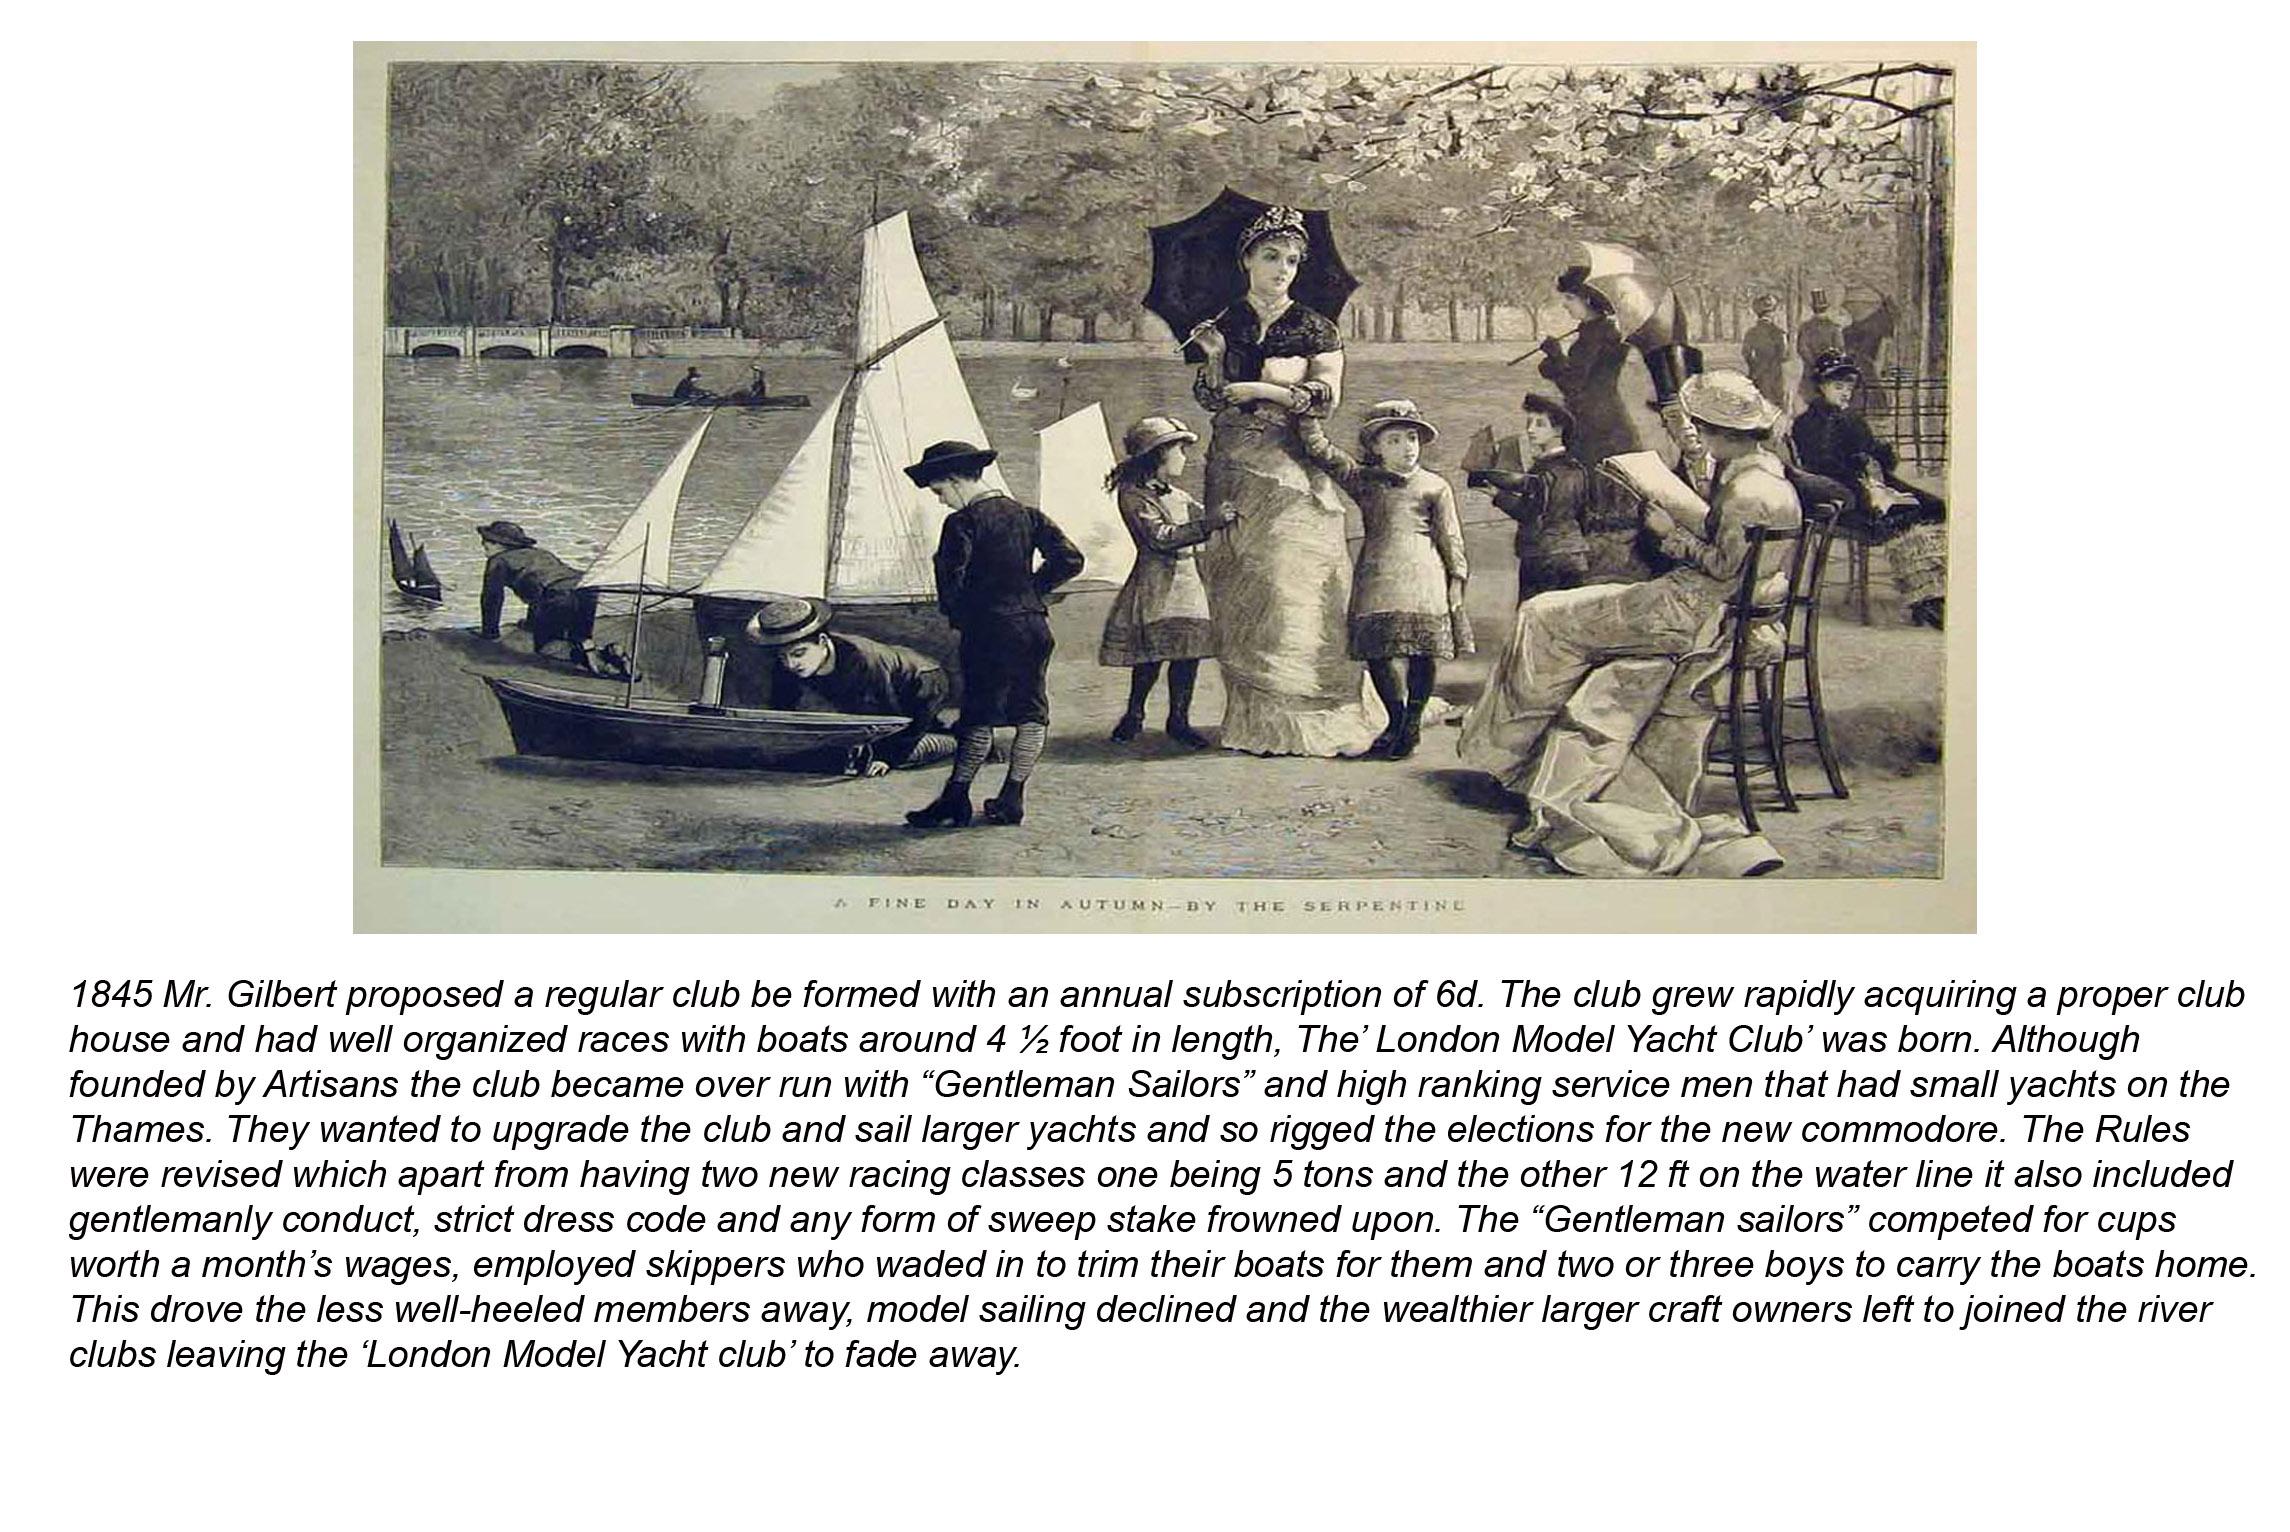 4 The first london model yacht club copy.jpg